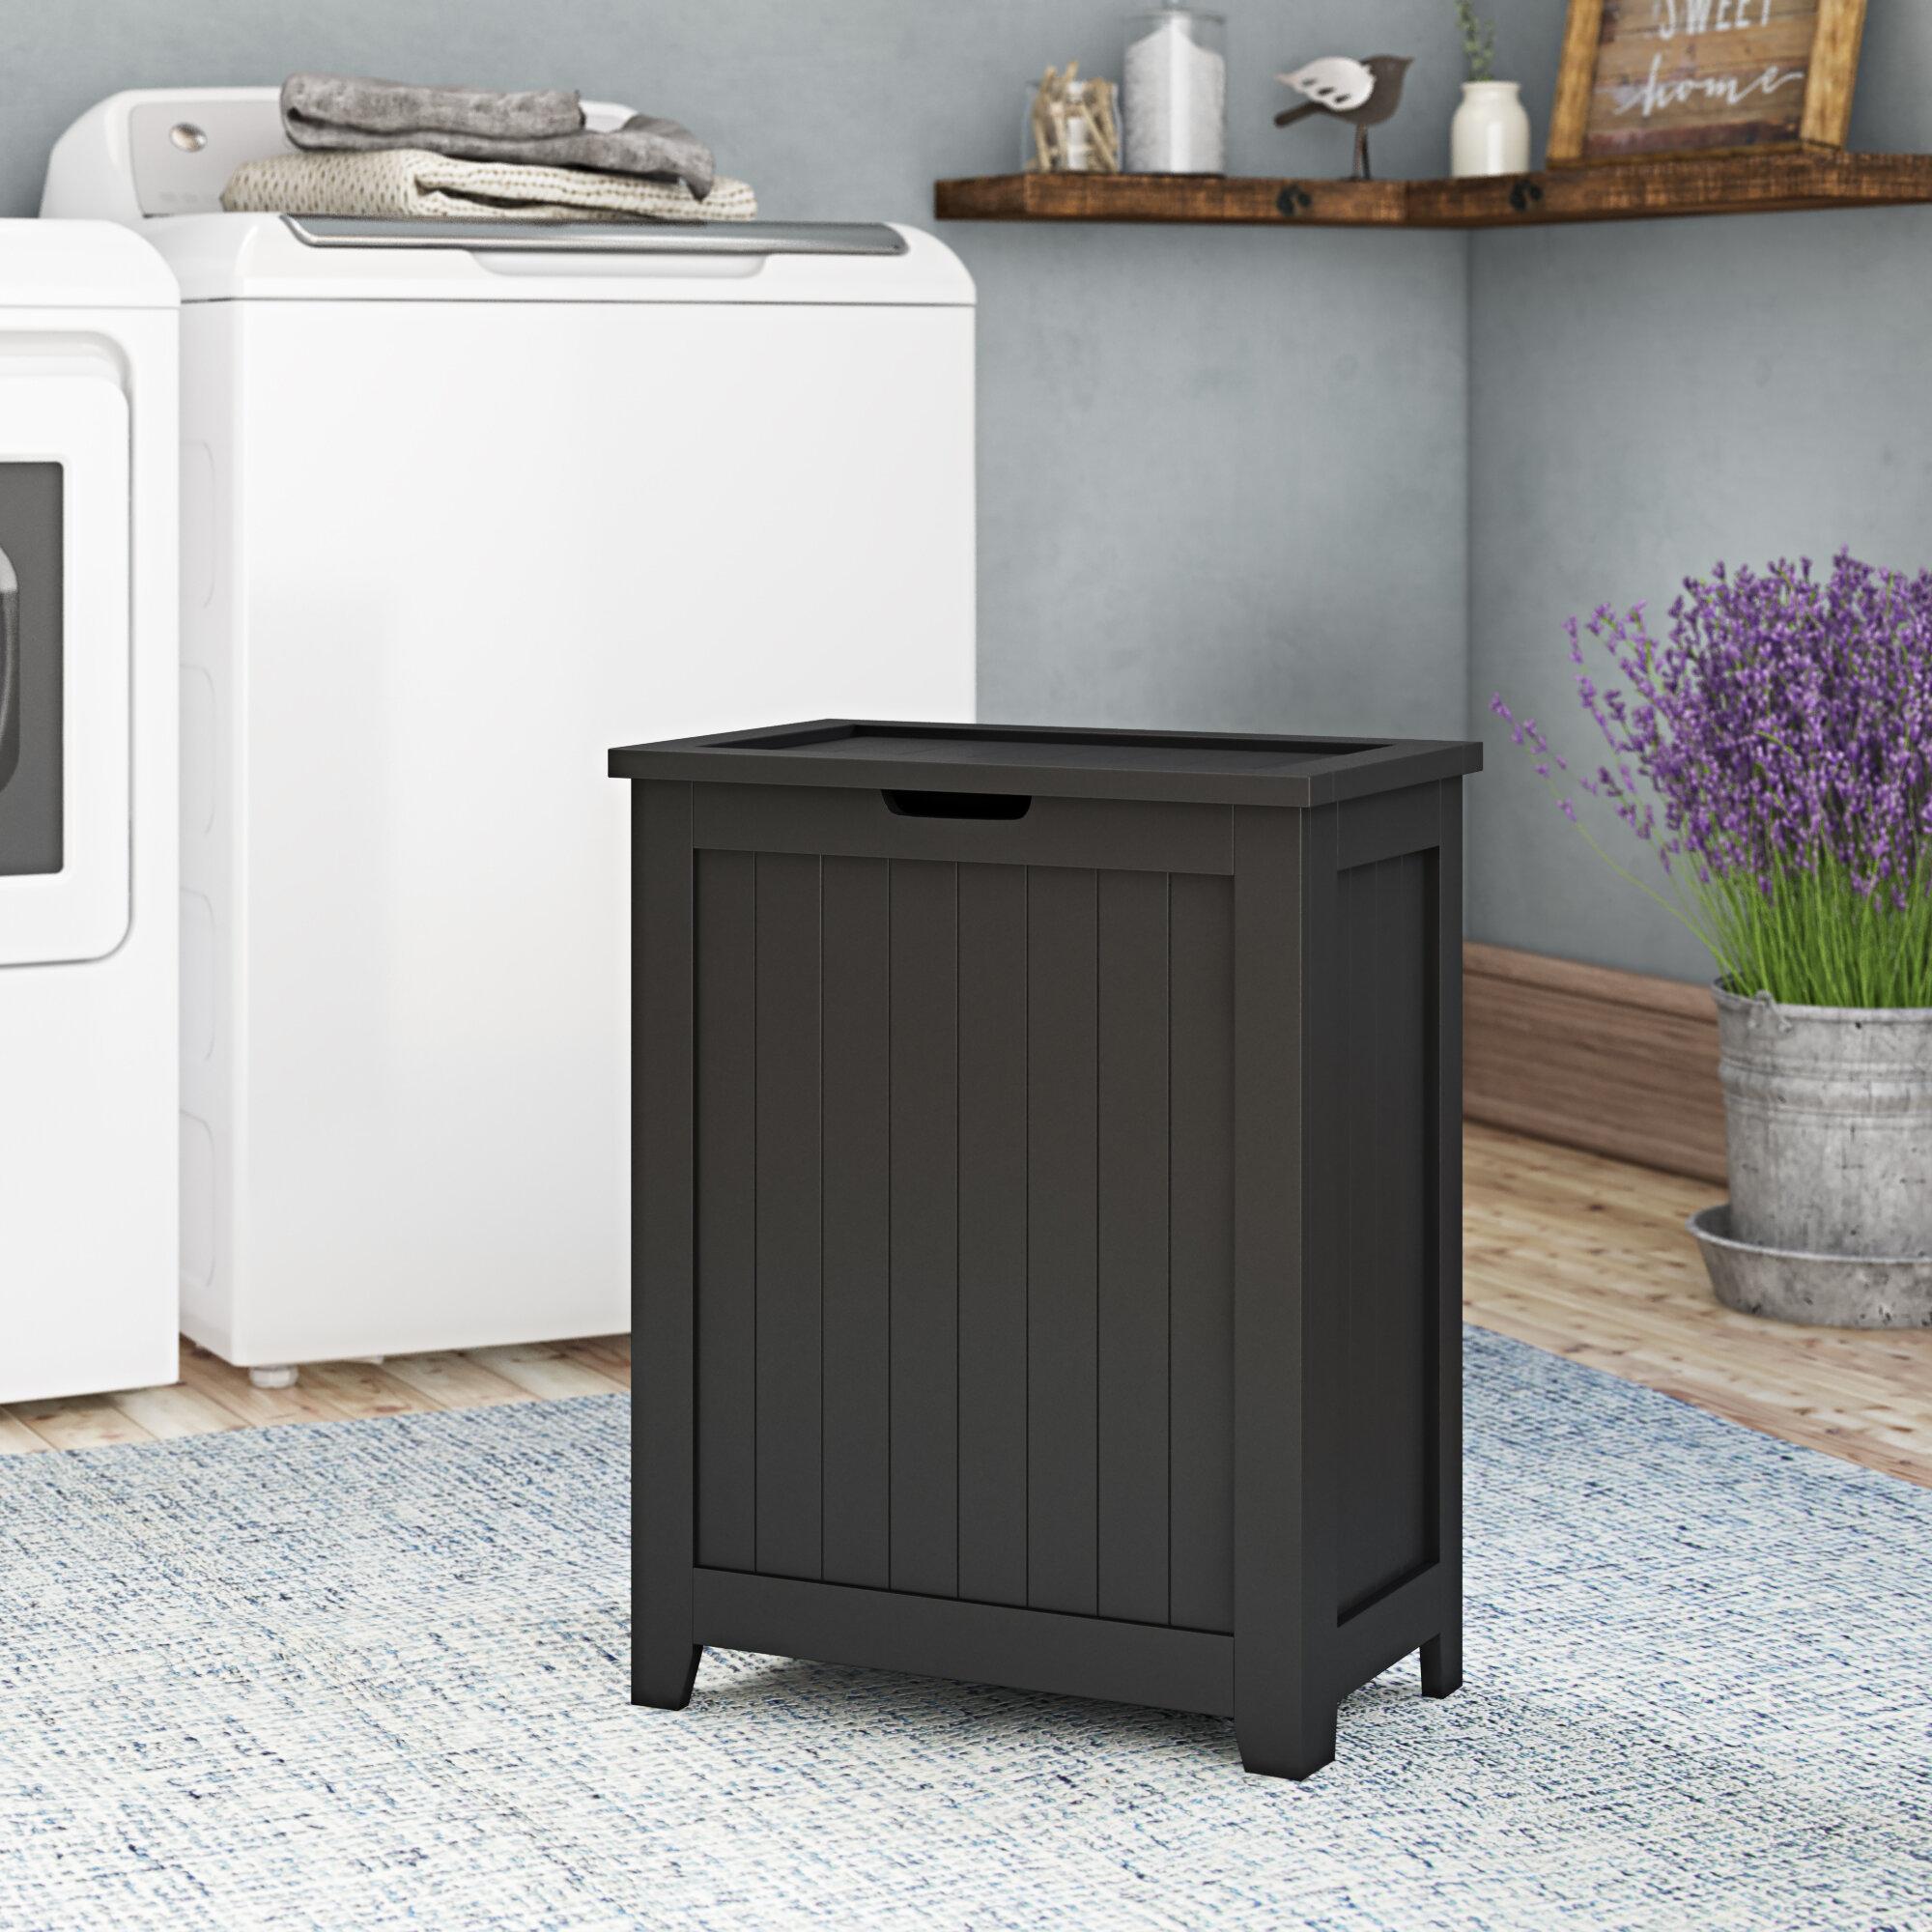 Laurel Foundry Modern Farmhouse Hampers Laundry Baskets You Ll Love In 2021 Wayfair